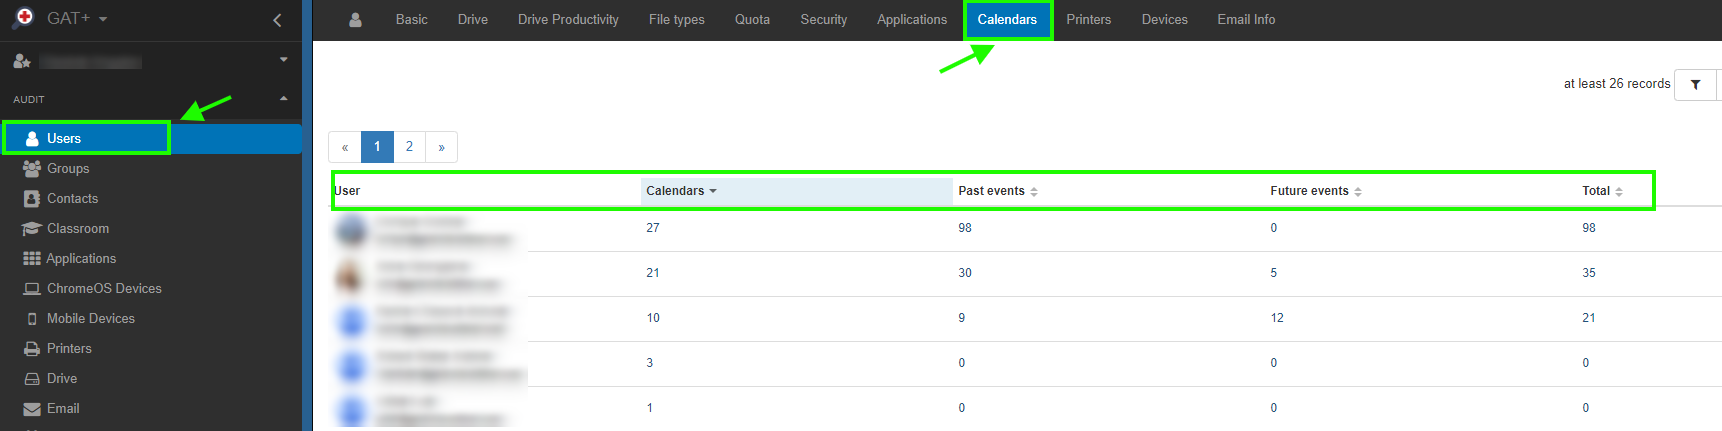 GAT+: Google Calendar Audit 3